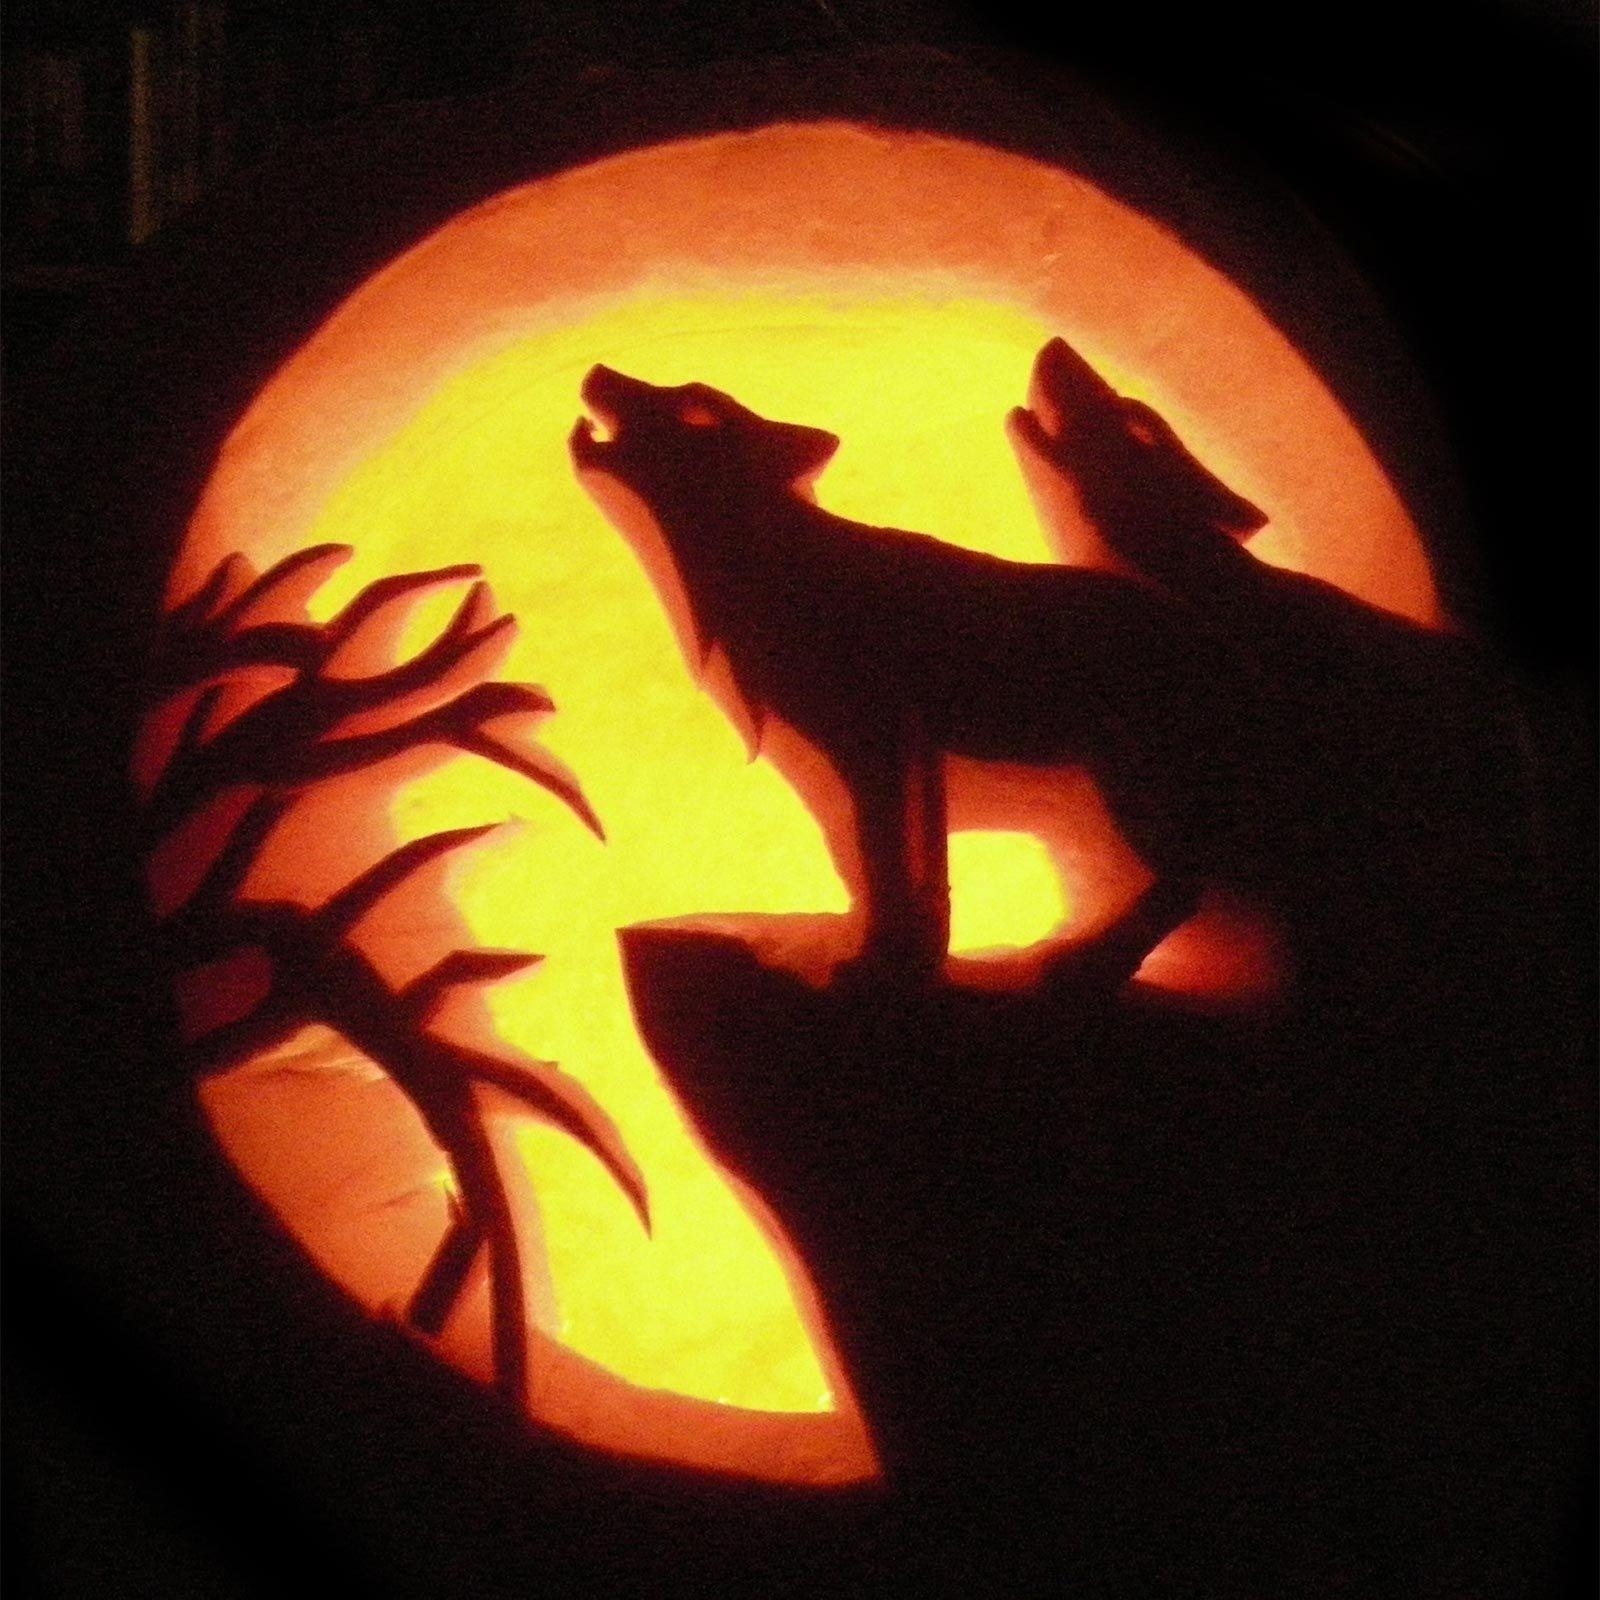 10 Fantastic Cool Ideas For Carving A Pumpkin cool pumpkin cravings 28 best cool scary halloween pumpkin carving 2020